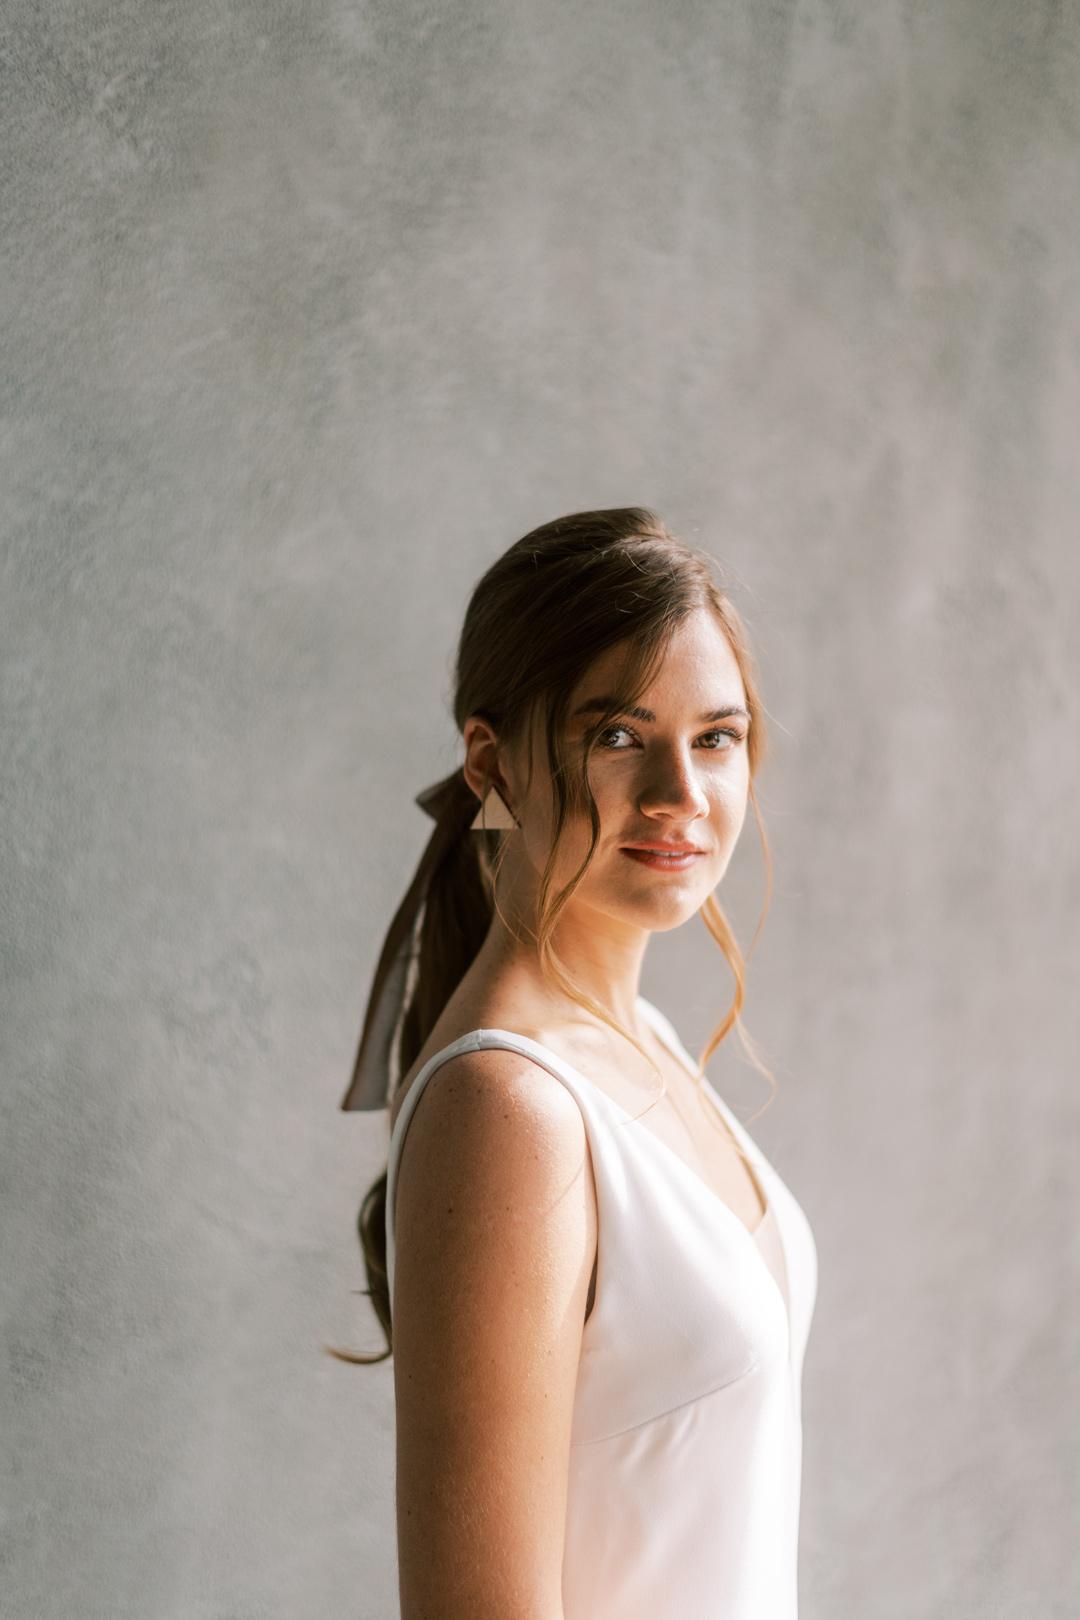 Portrait of a woman in white wedding dress